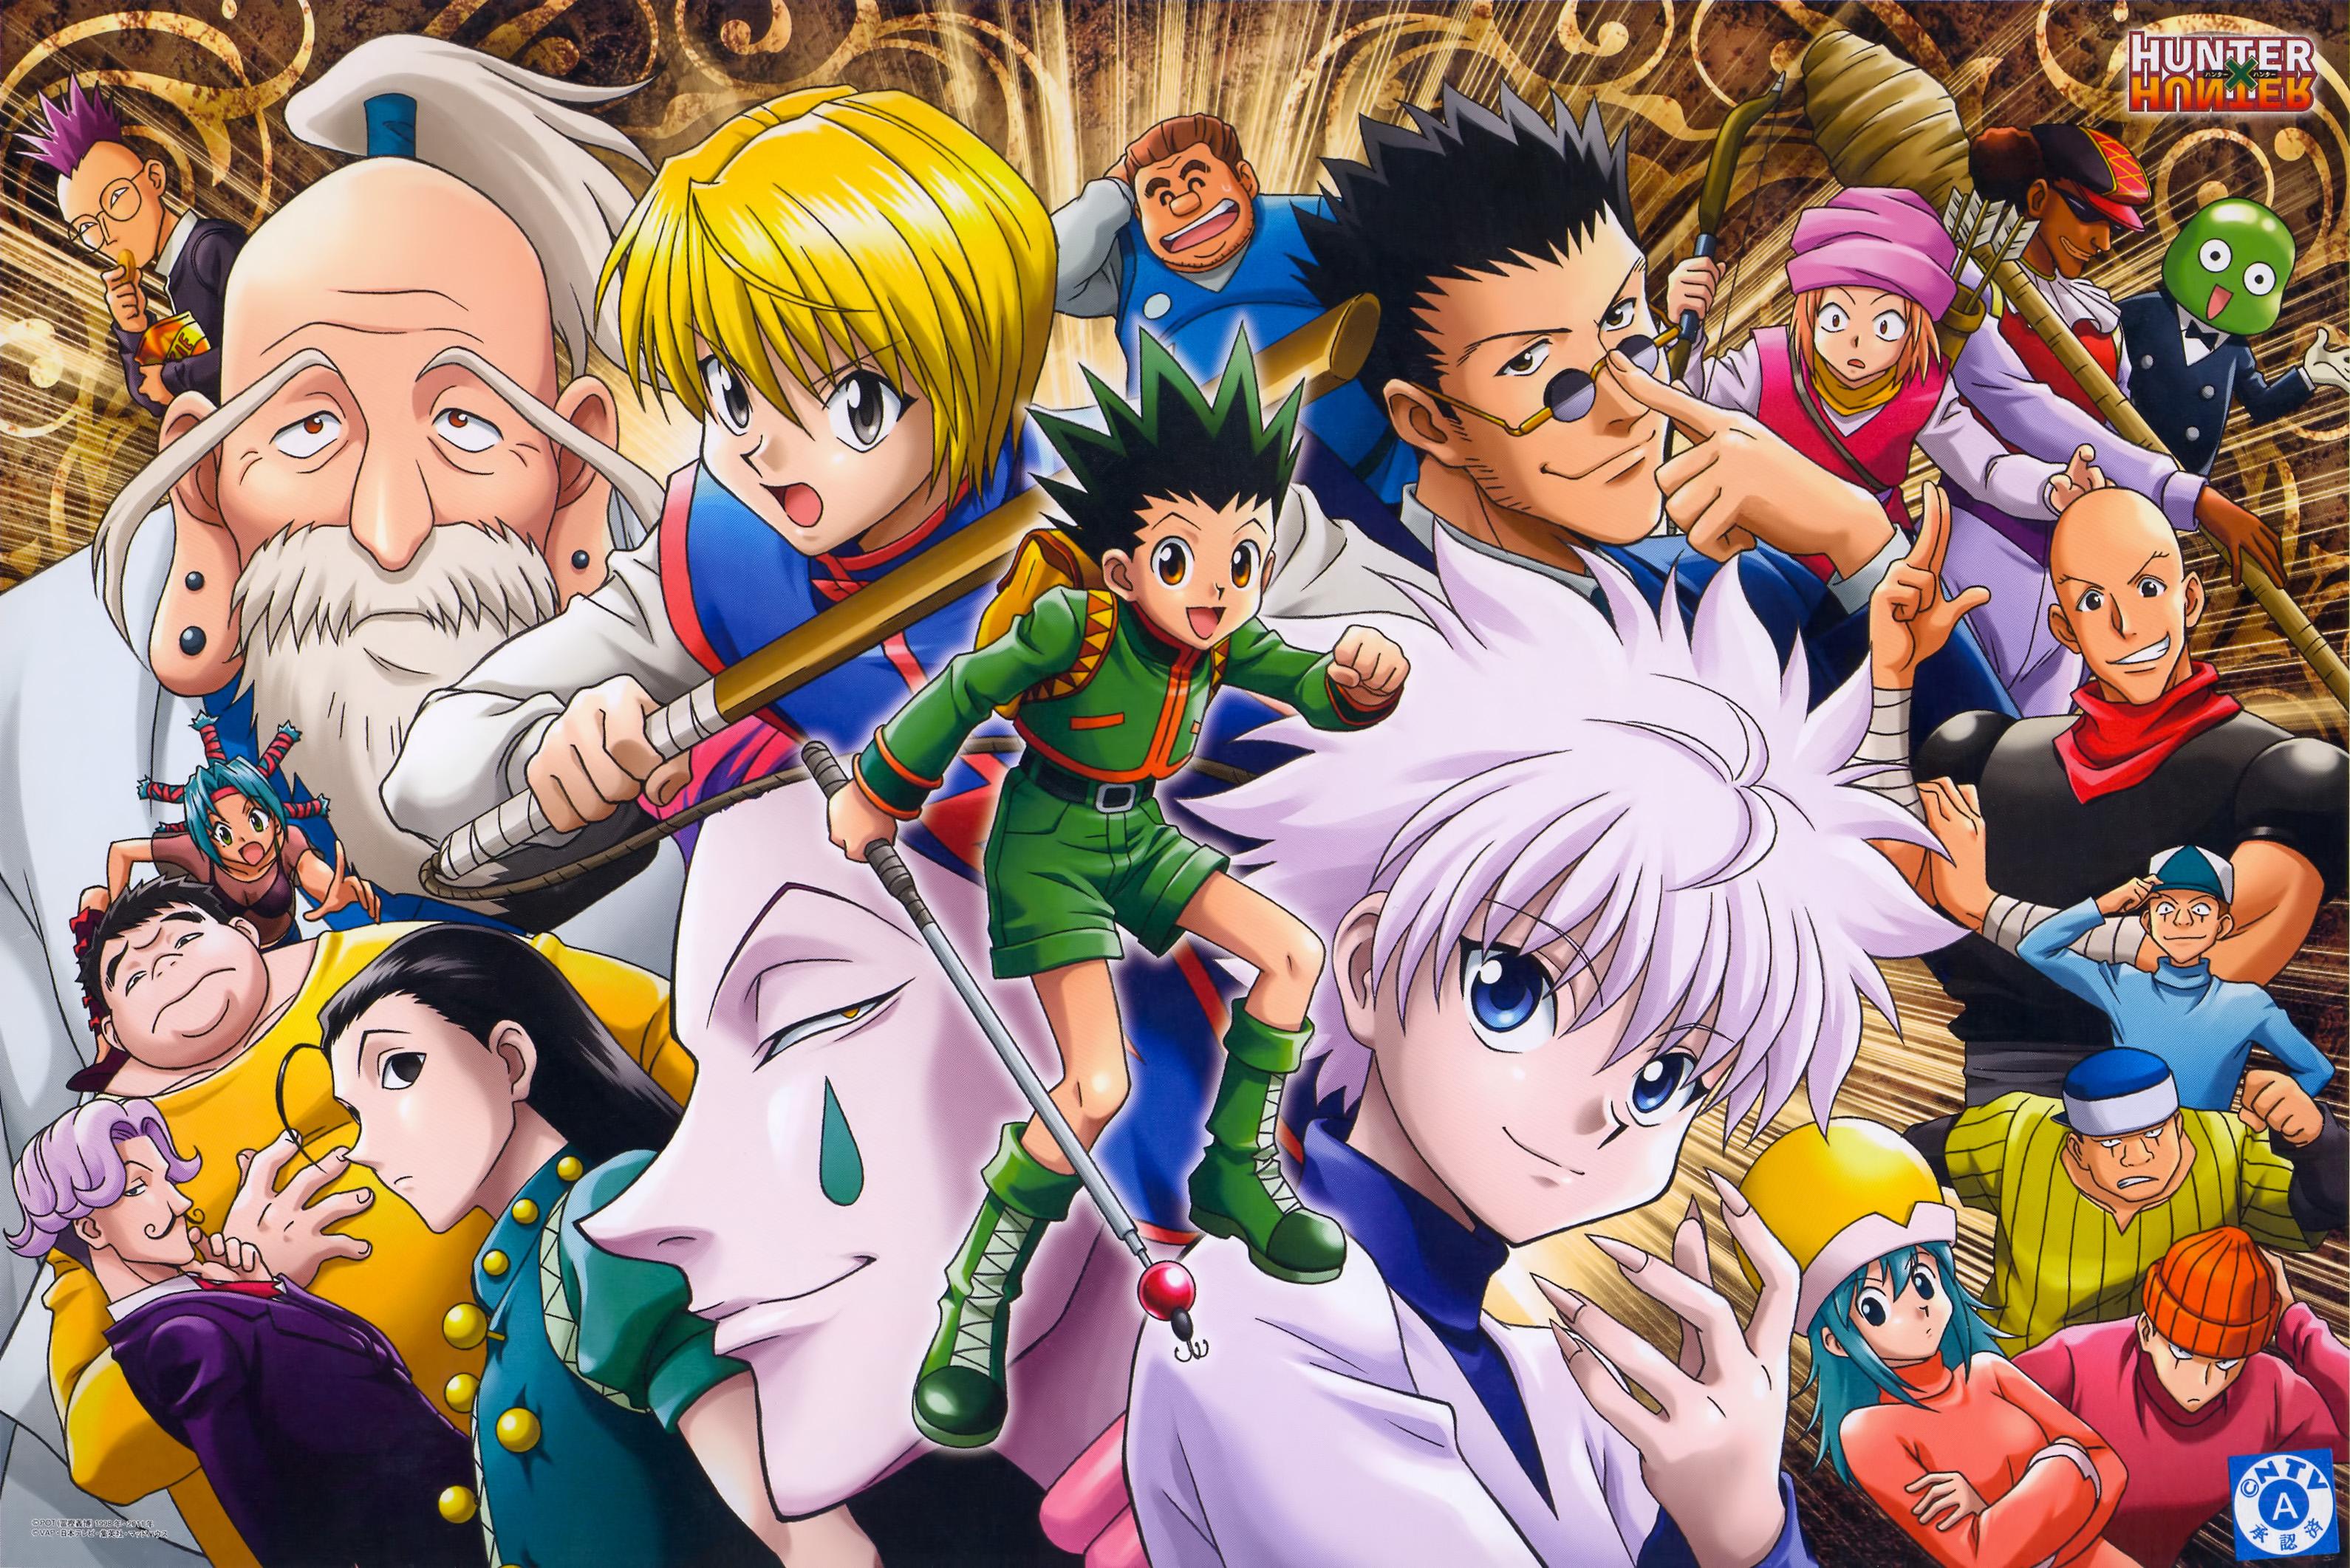 Hunter x Hunter Anime HD Wallpaper Animation Wallpapers 3181x2123